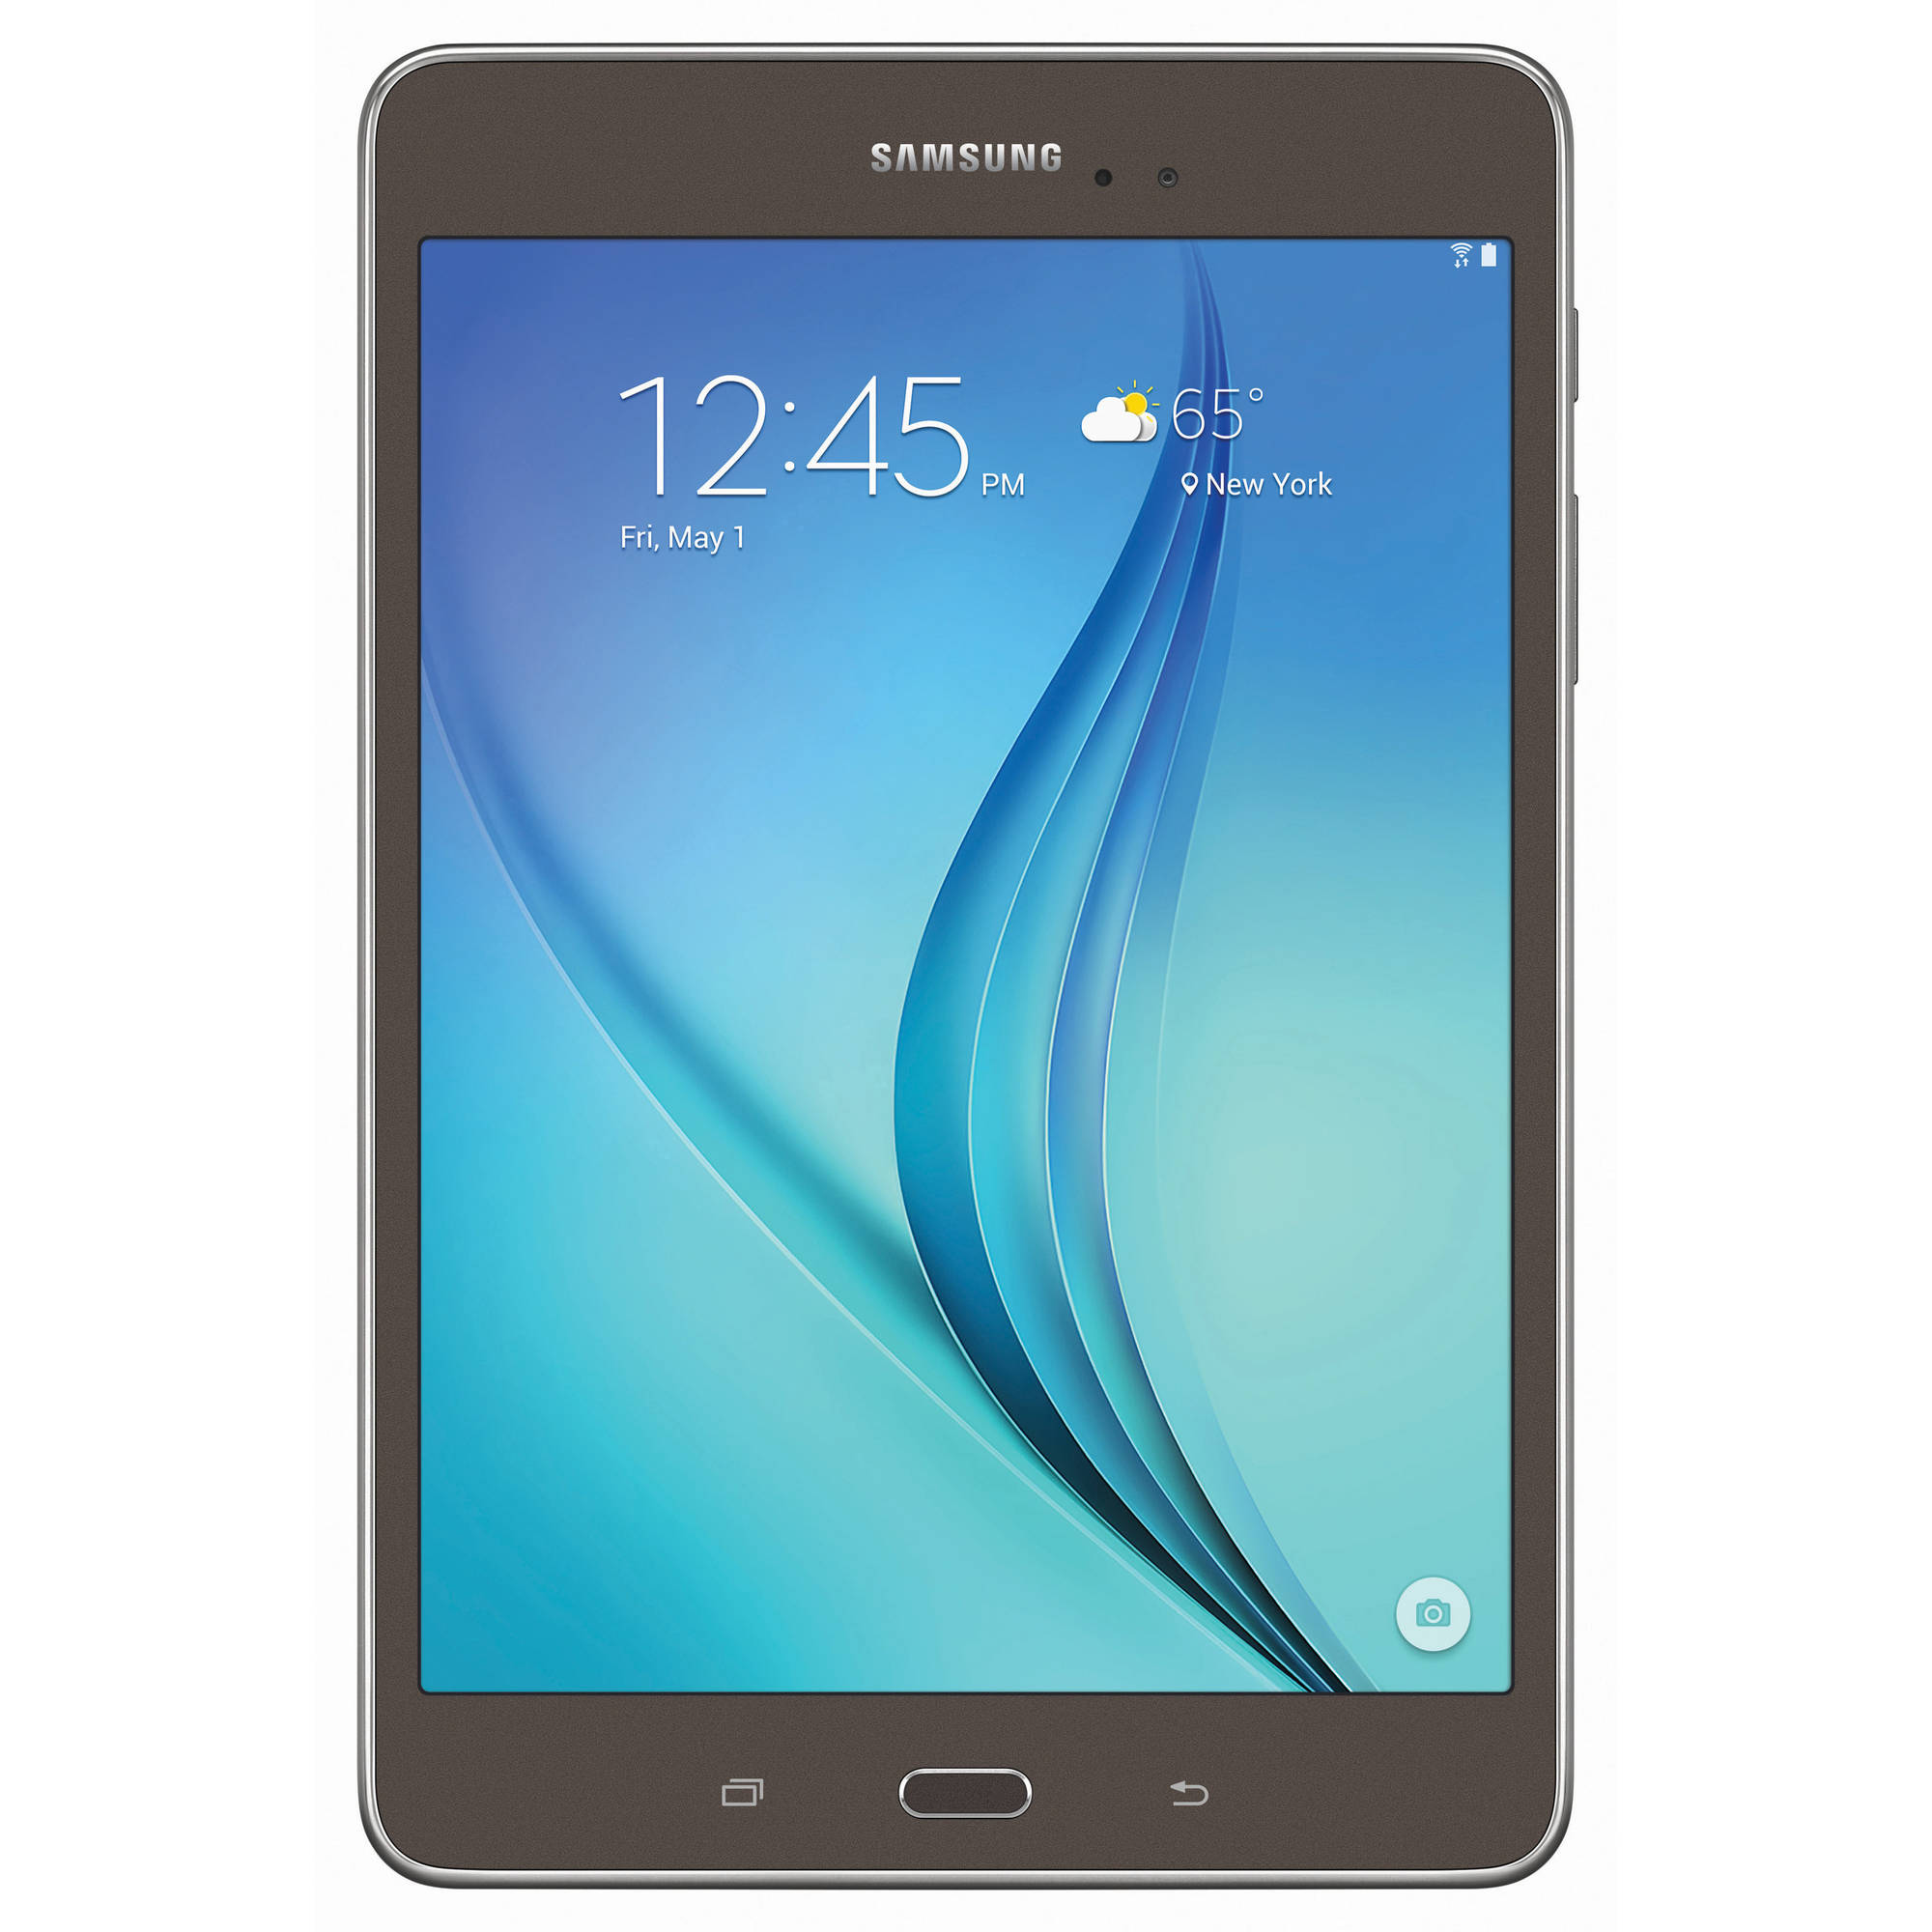 Samsung Galaxy Tab A 8 Tablet 16gb Smoky Titanium Refurbished A5 New 2016 Sm Ram 2 Memori